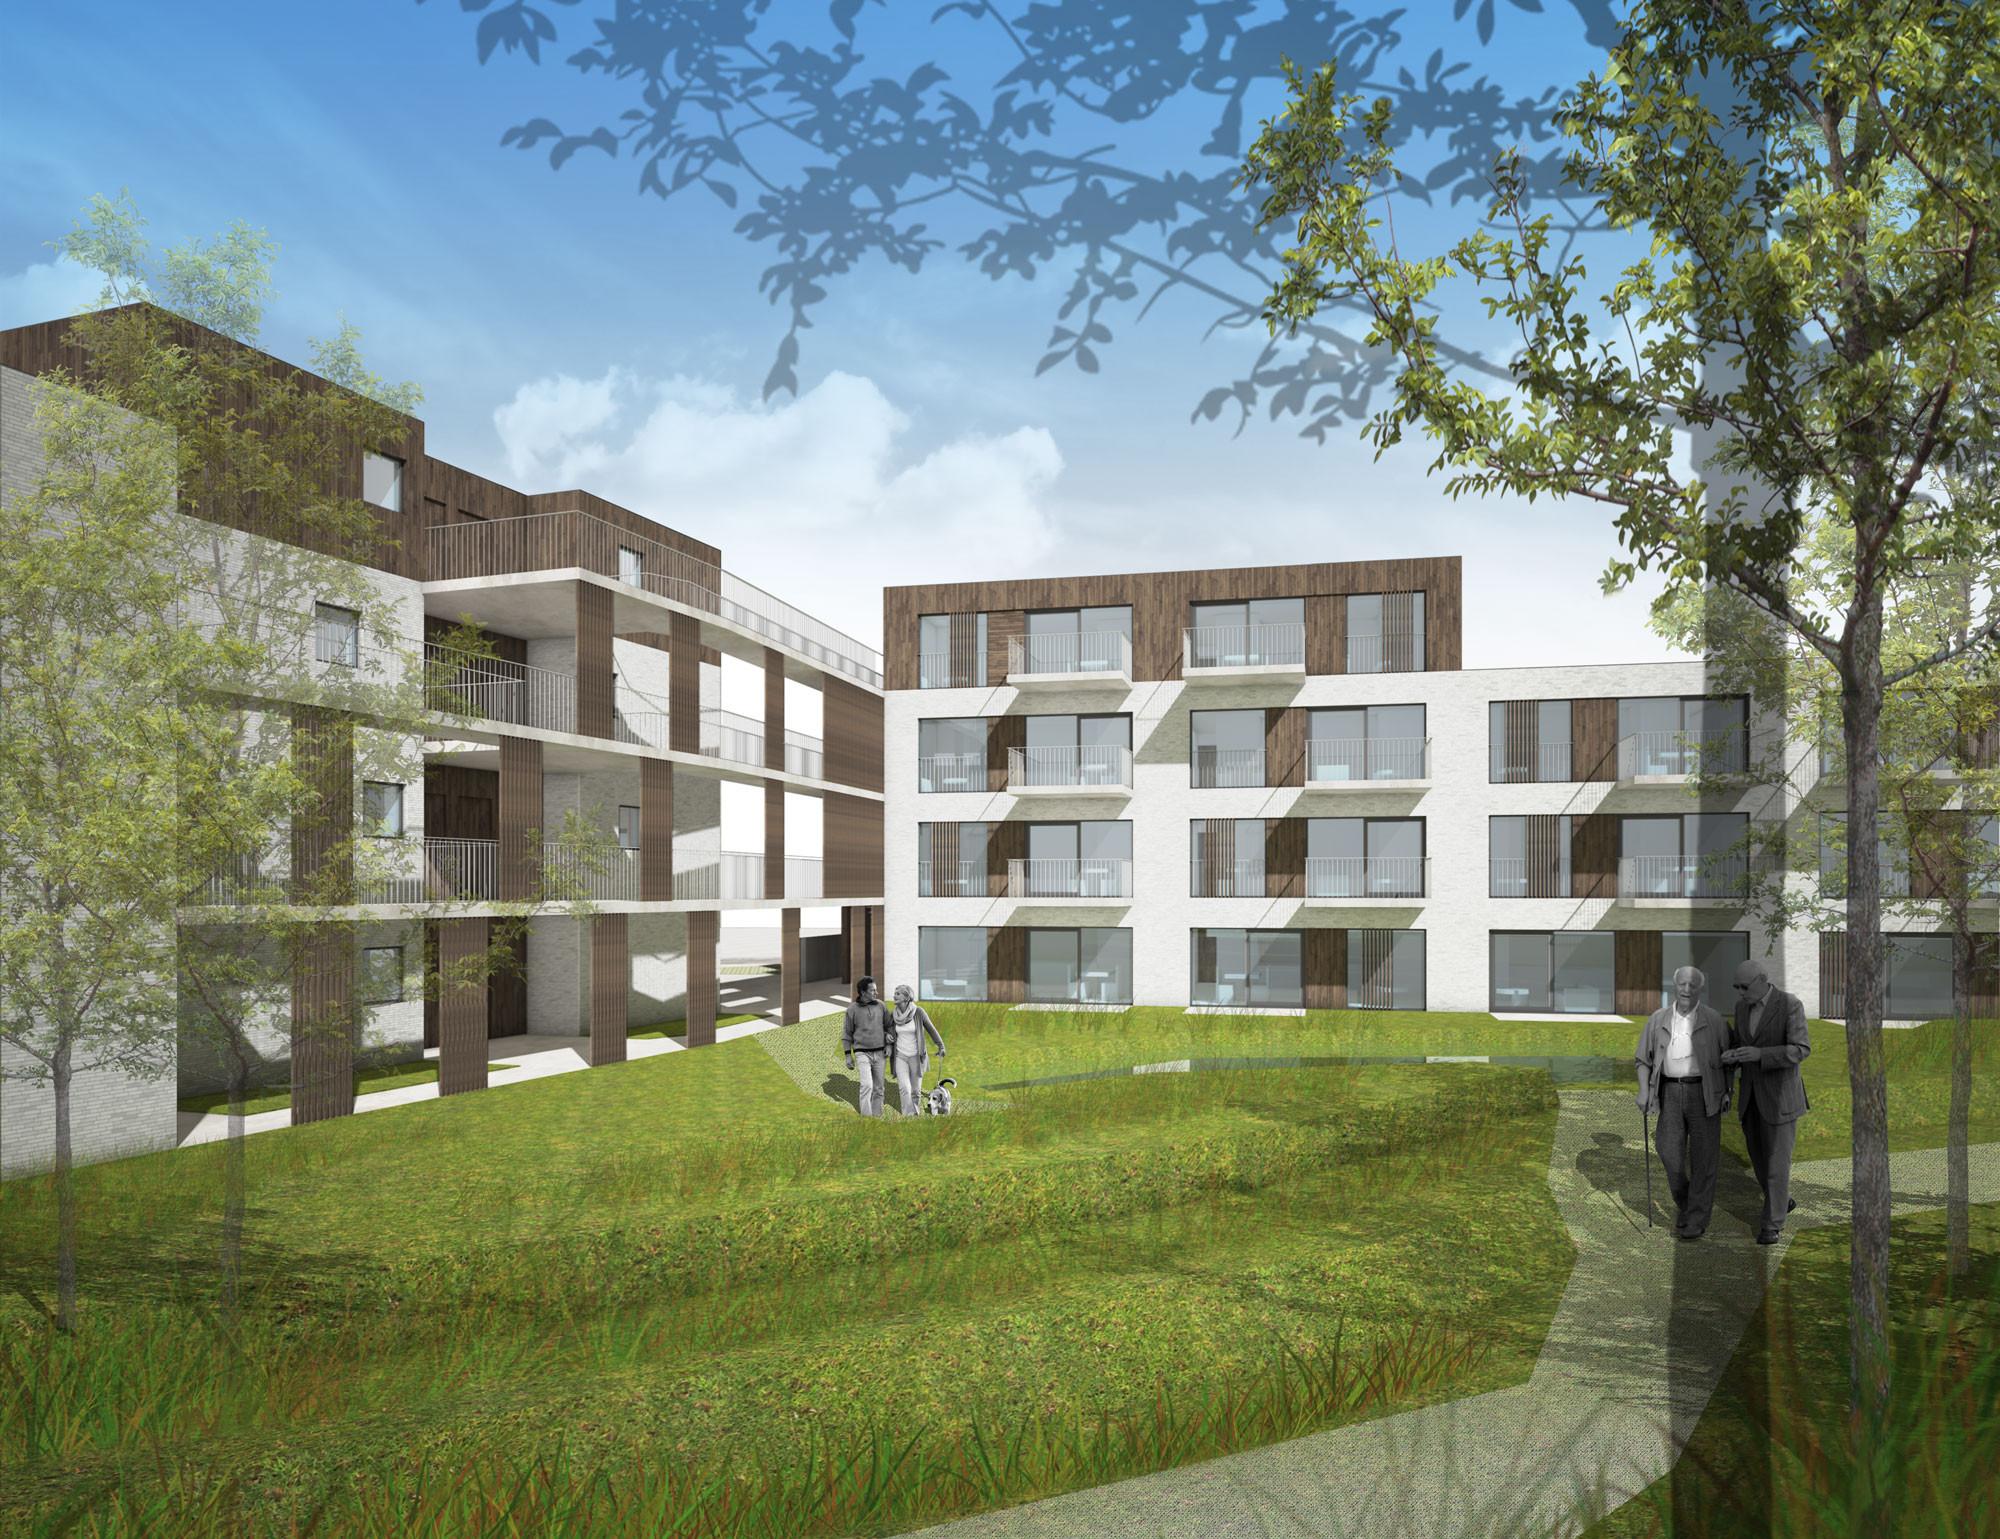 Sociale huisvesting architectuurwedstrijd2_Dijsegem Merelbeke_Claeys Architecten.jpg